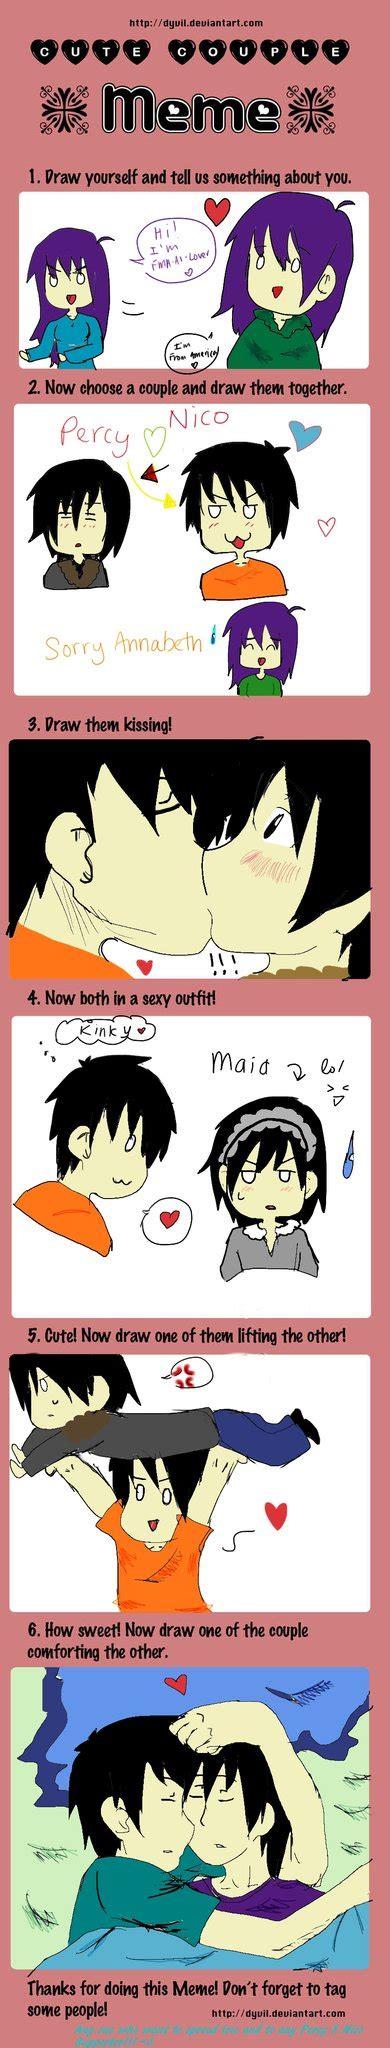 Cute Couple Meme - cute couple memepercy x nico by fma al lover on deviantart